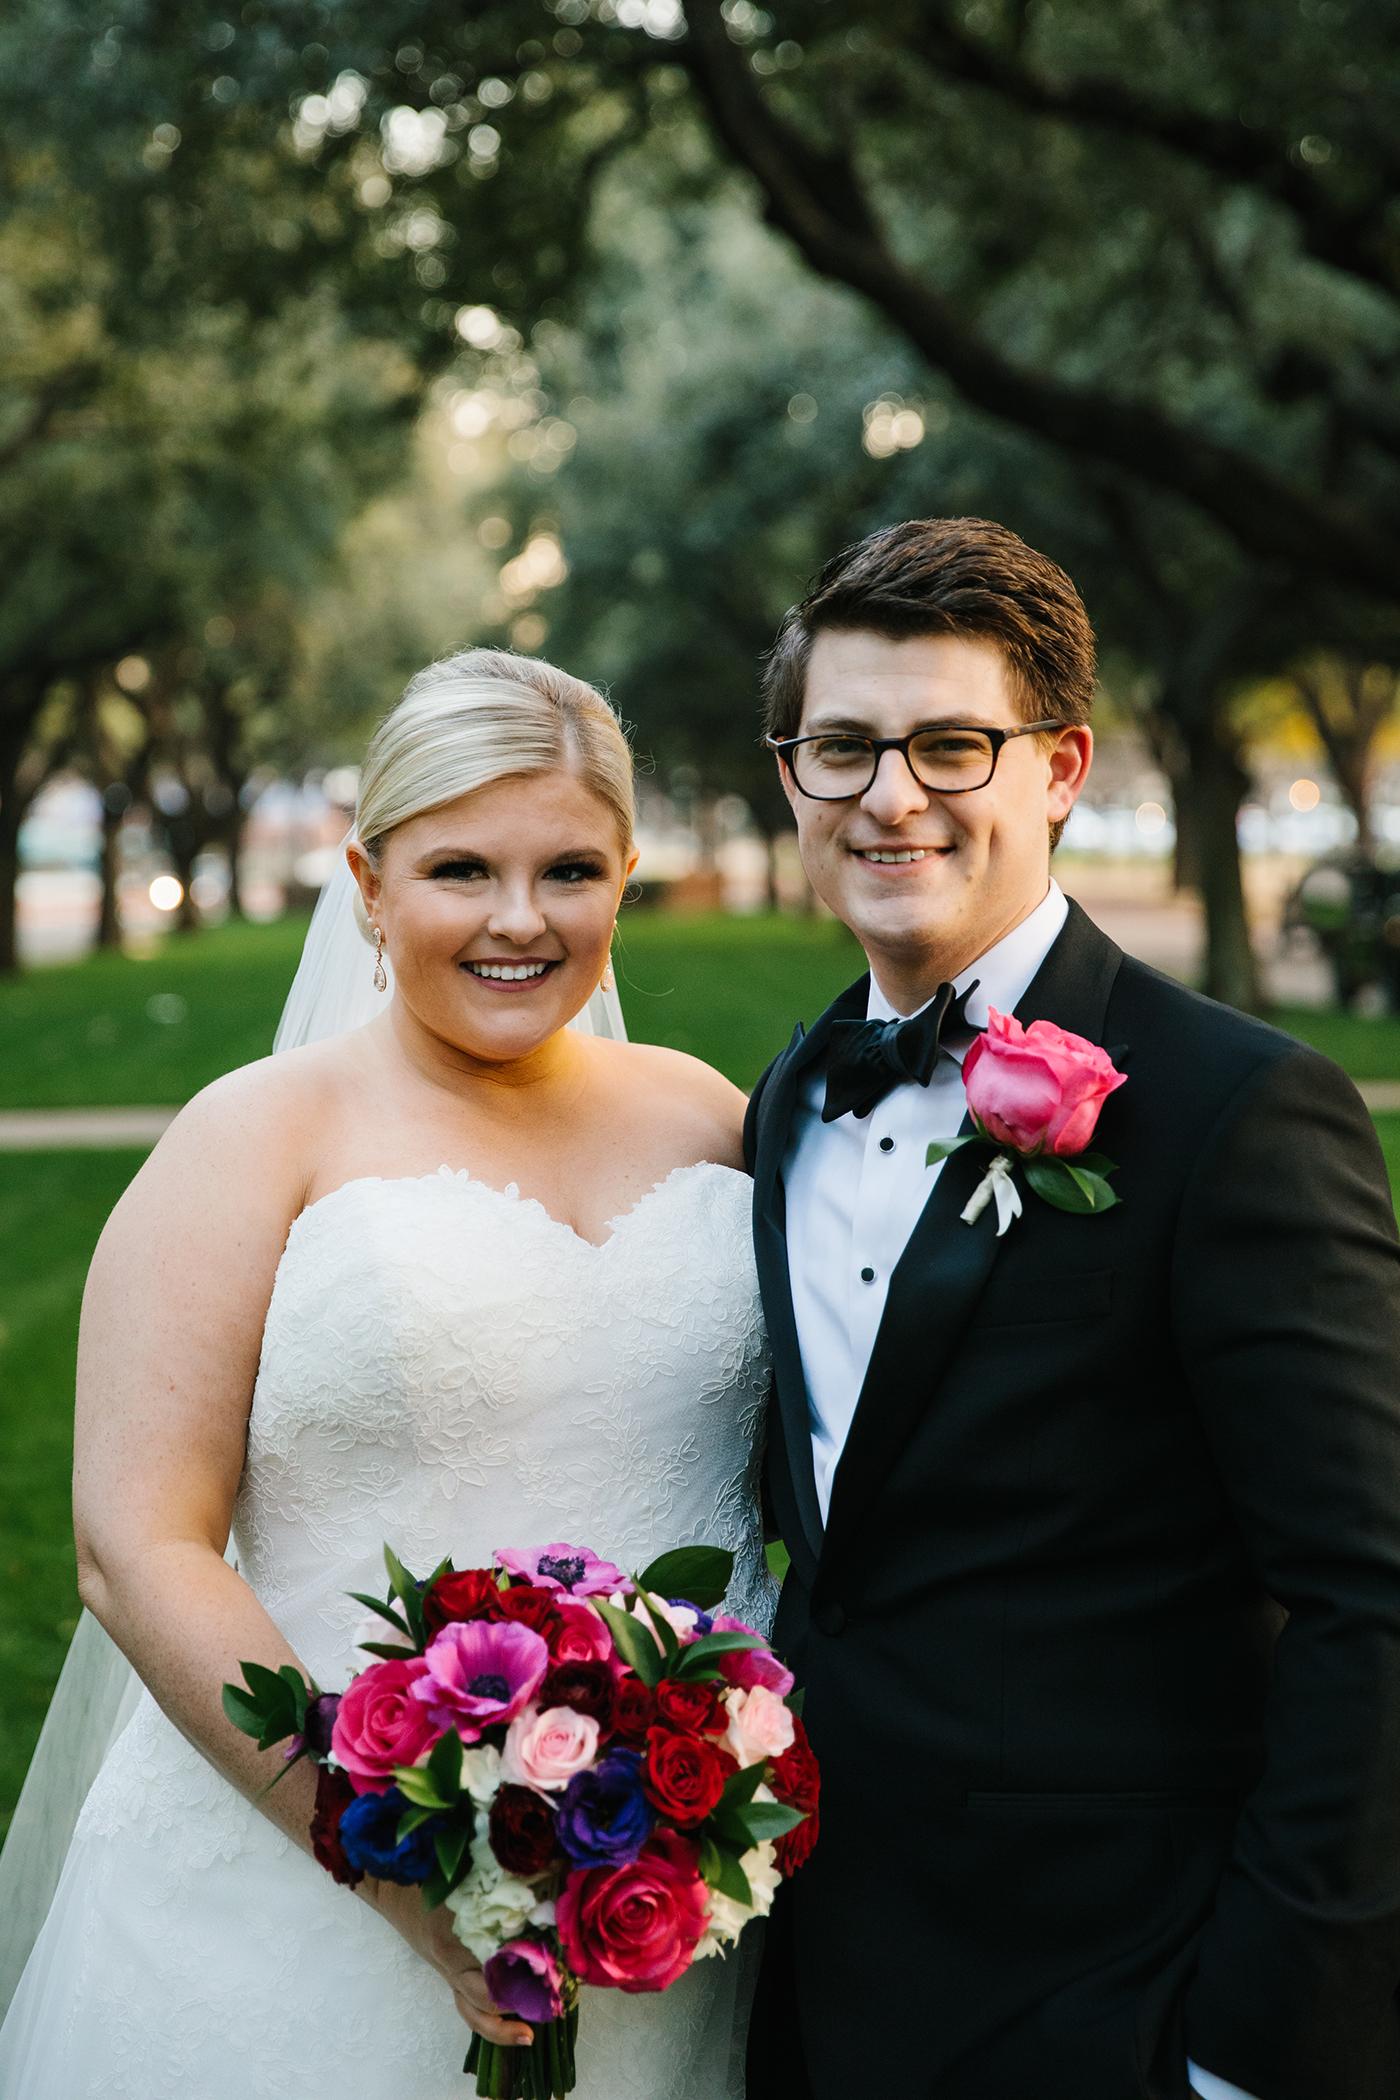 Dallas Weddings Planner - Allday Events - Katie + Matthew at The Adolphus Hotel - 471.jpg